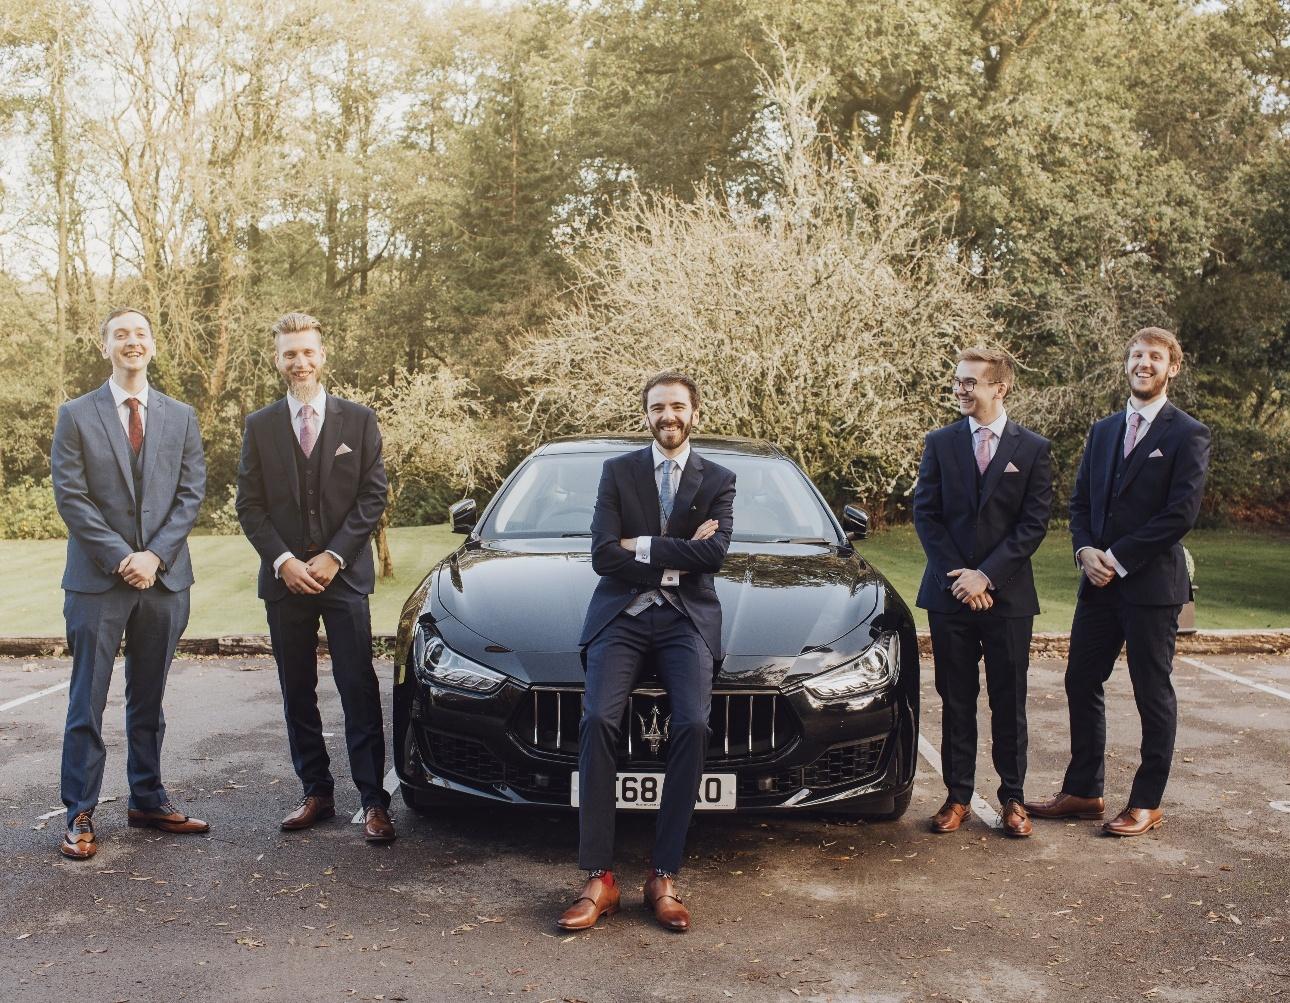 Groomsmen with Maserati Ghibli